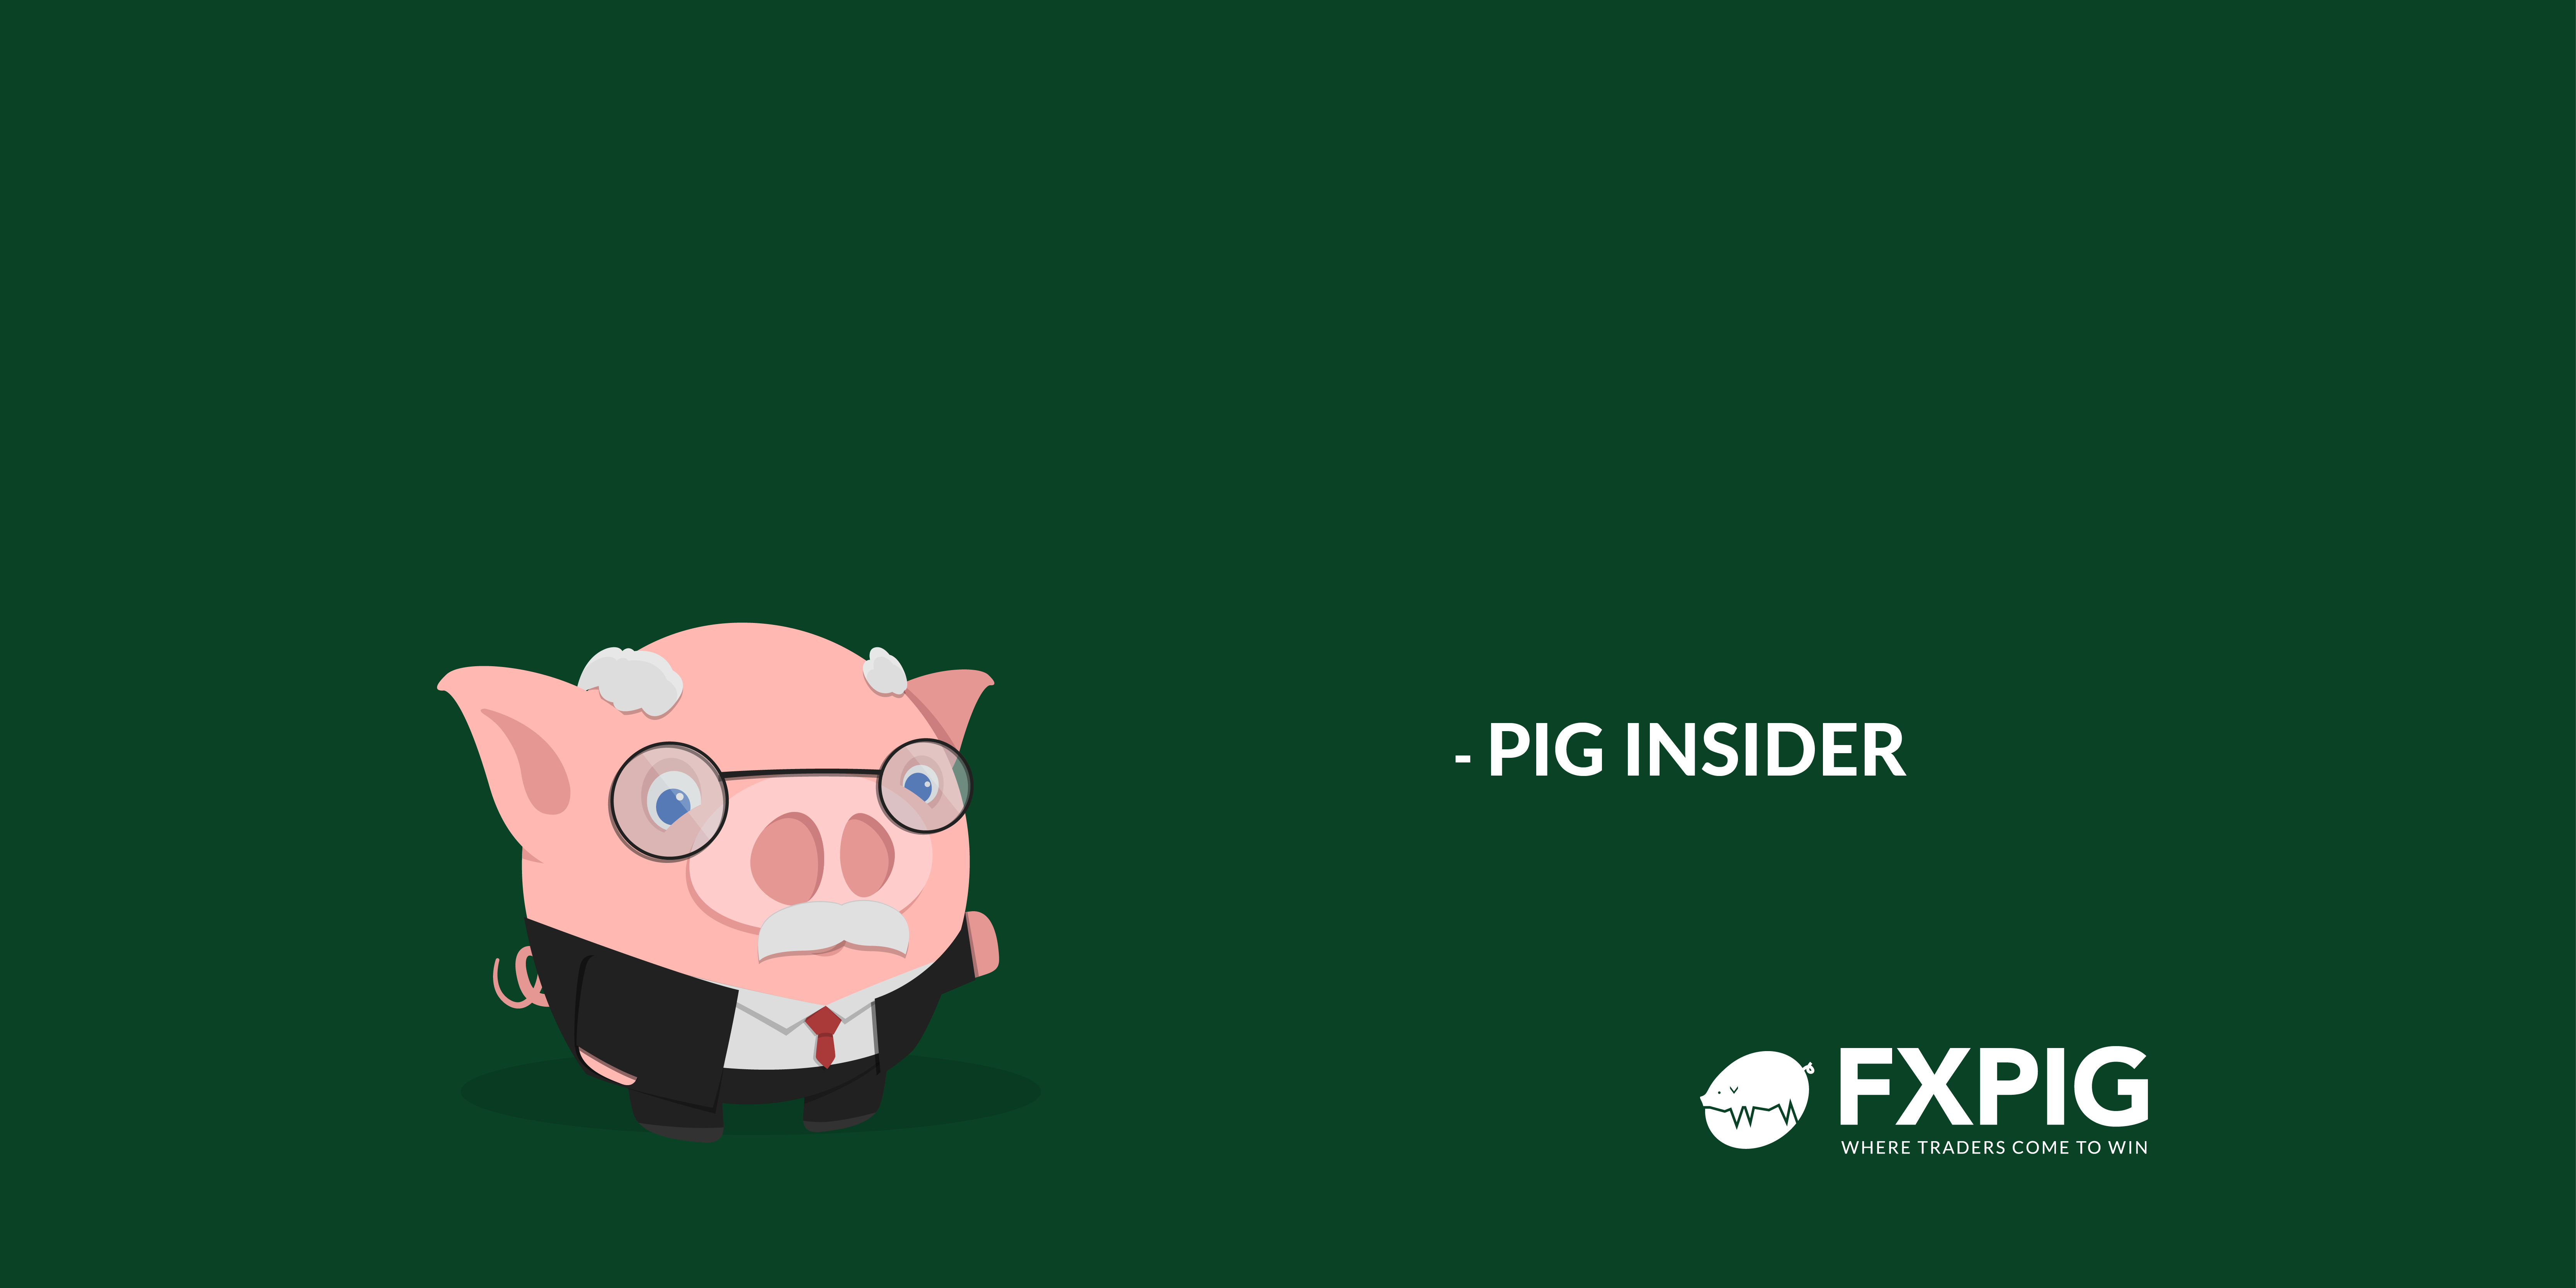 FOREX_Trading_quote-piginsider_FXPIG